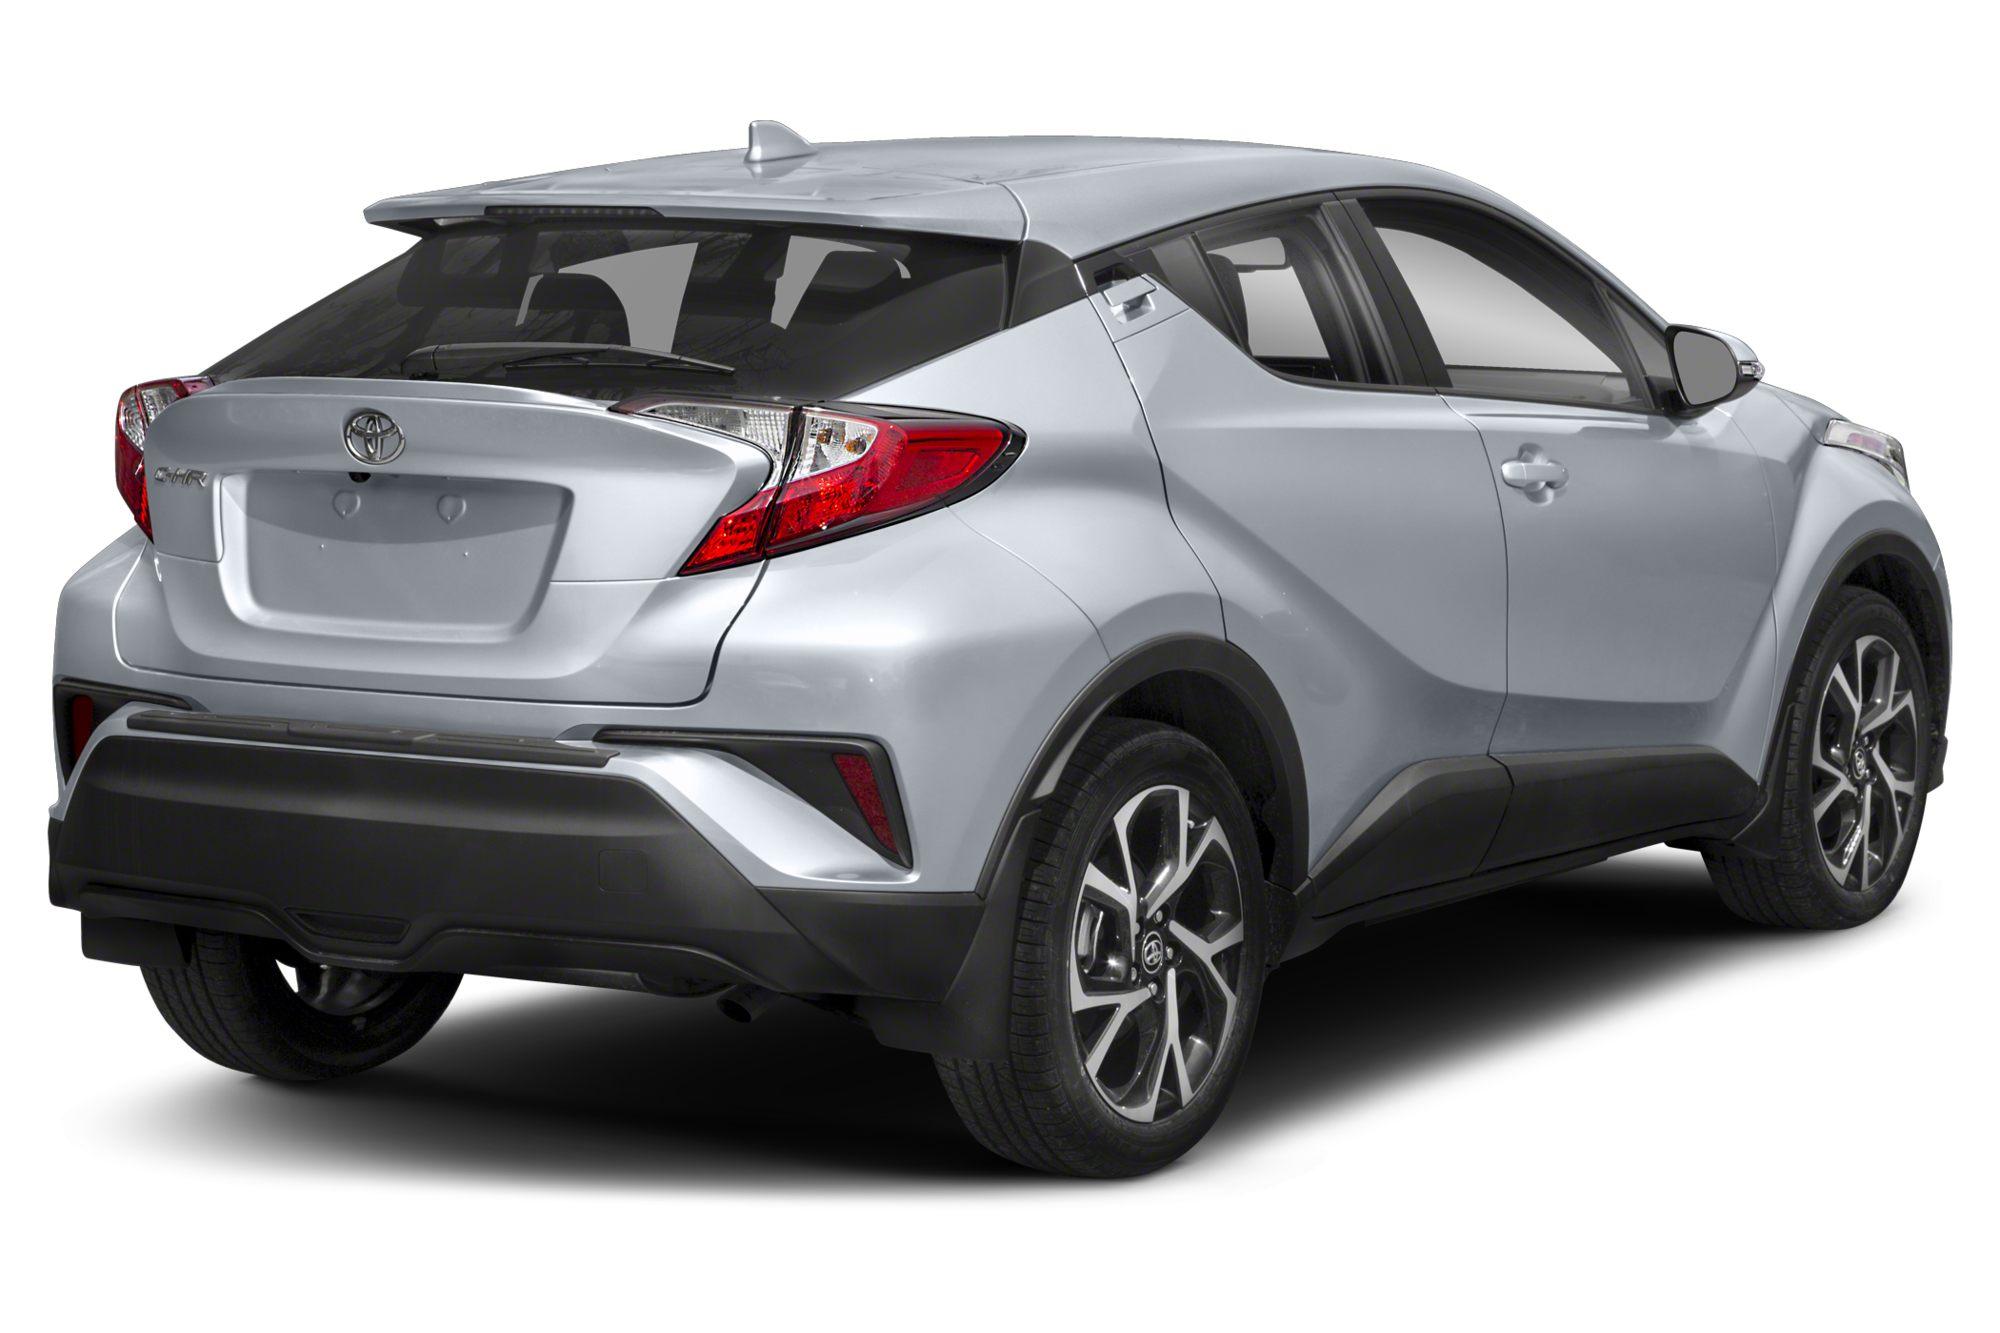 2019-20 Toyota C-HR, Corolla, Corolla Hybrid: Recall Alert